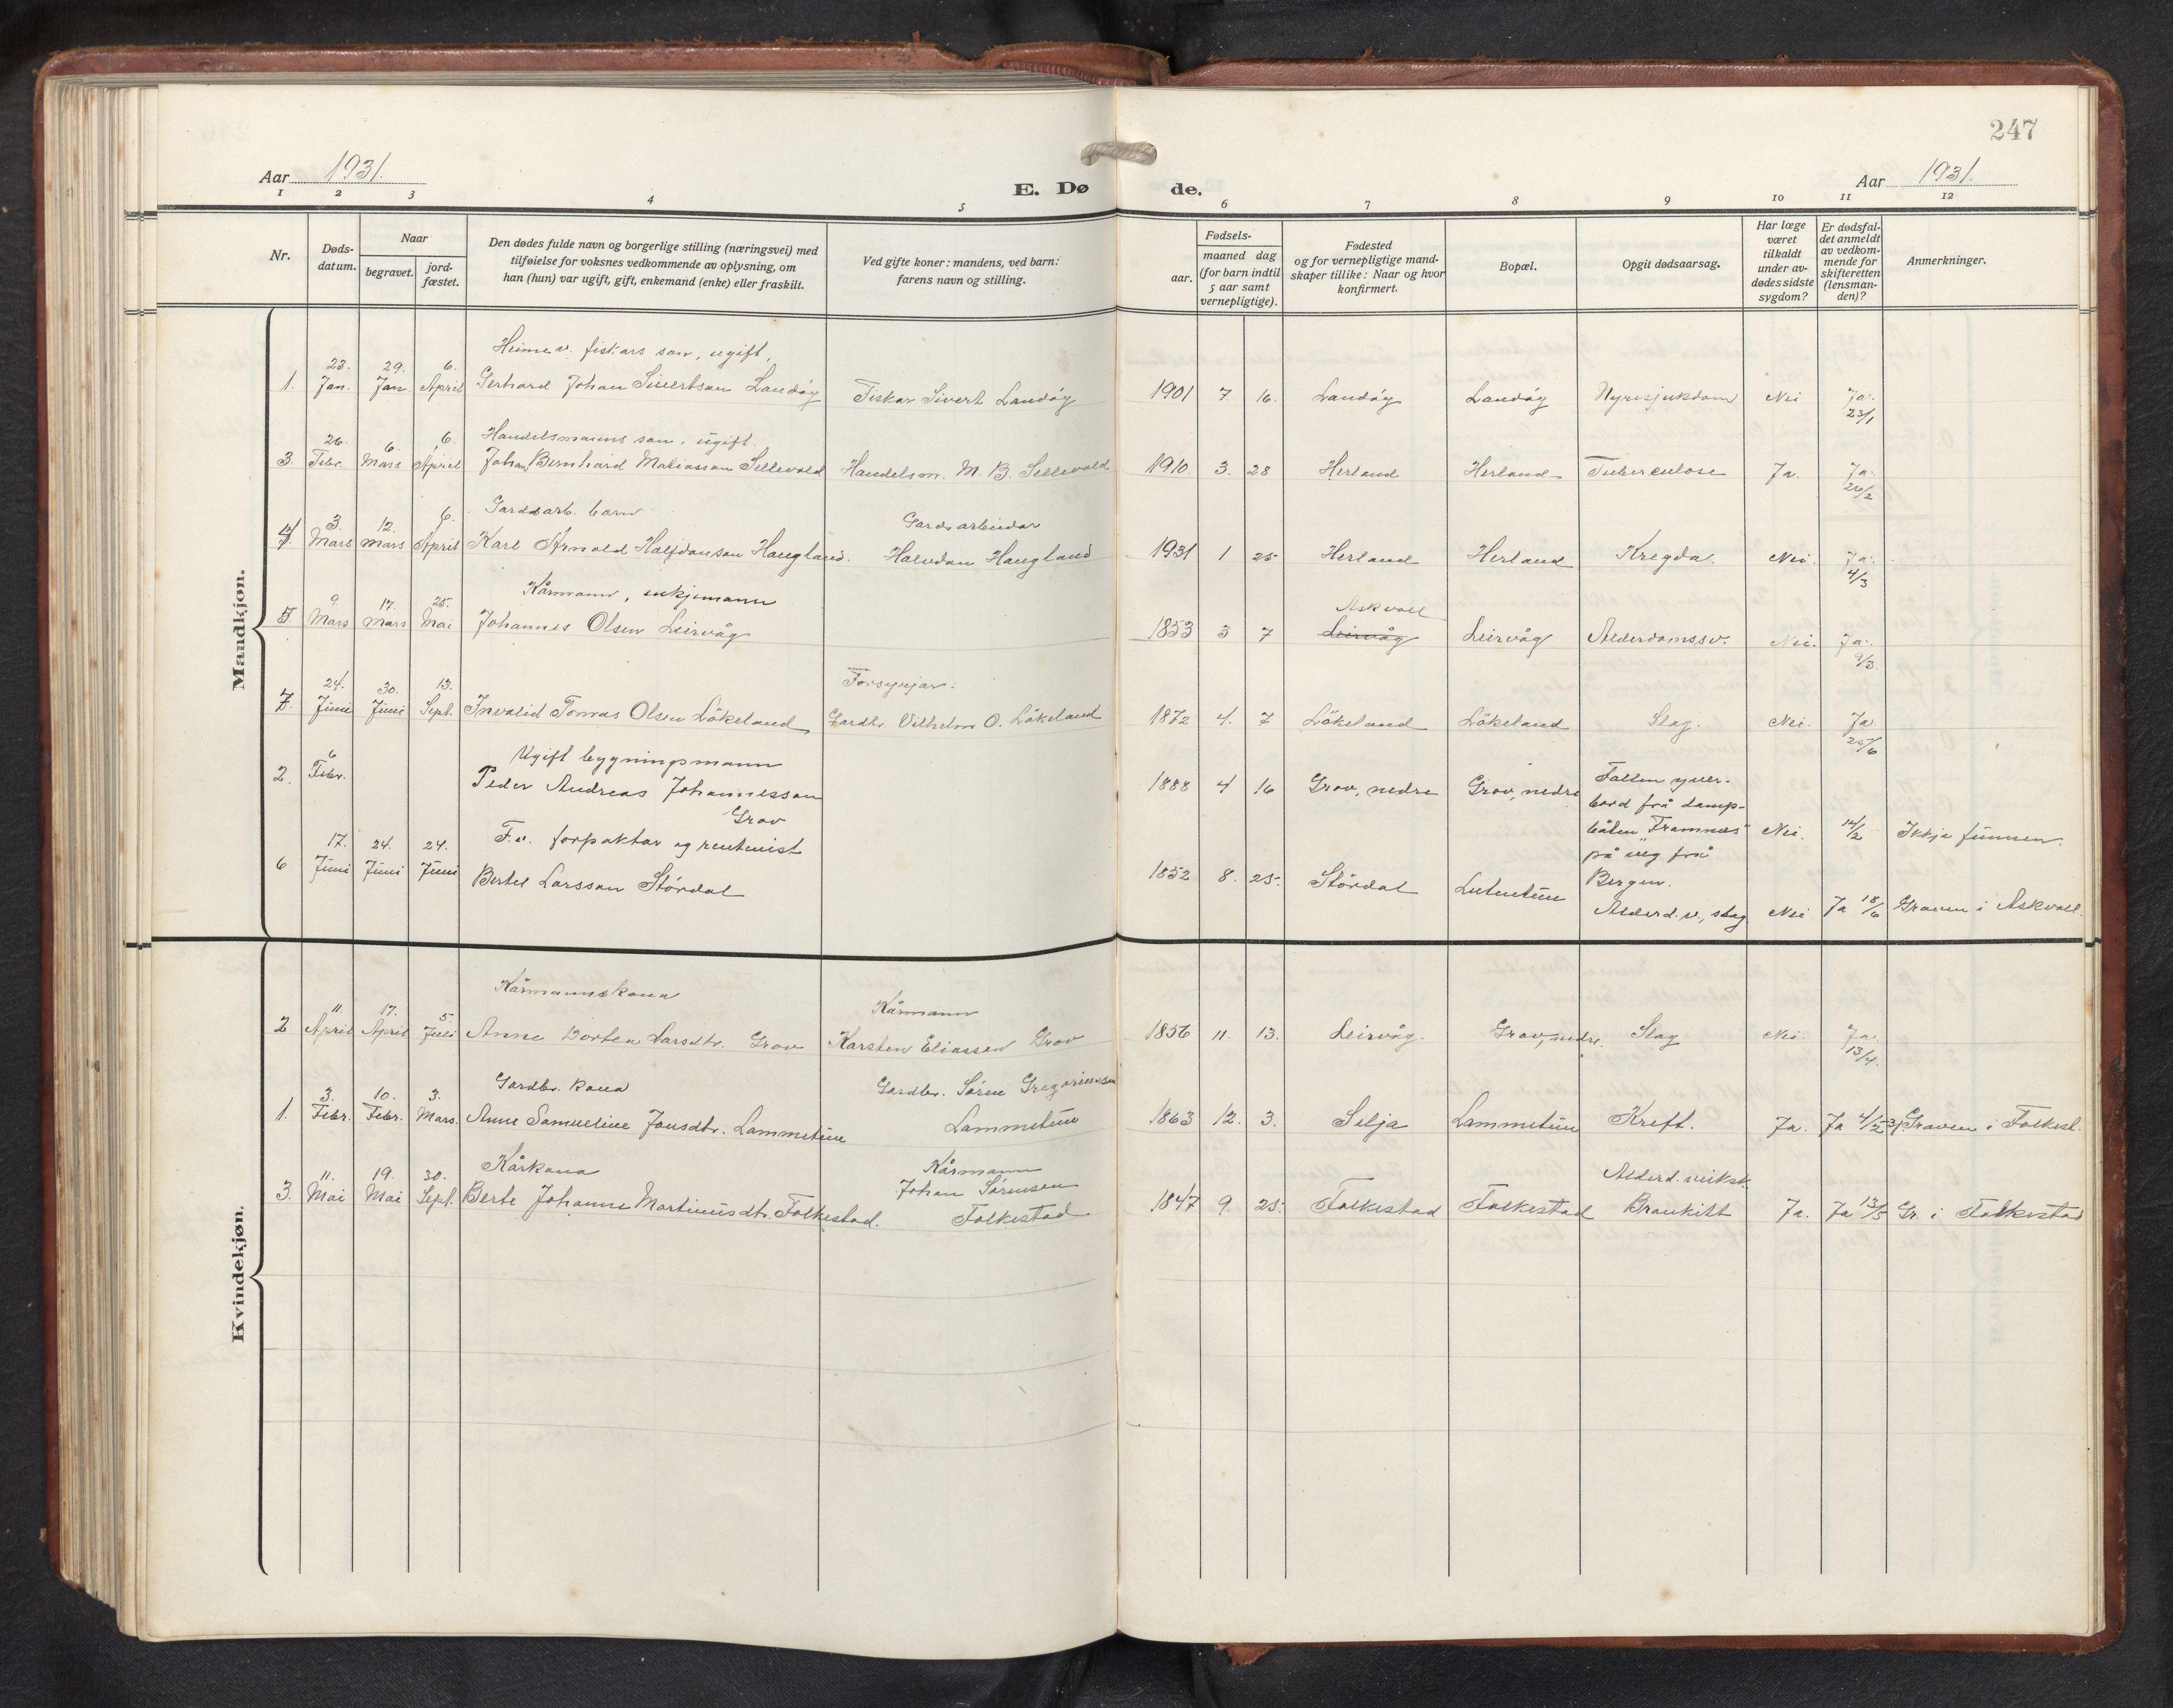 SAB, Askvoll sokneprestembete, H/Hab/Habb/L0002: Klokkerbok nr. B 2, 1910-1947, s. 246b-247a